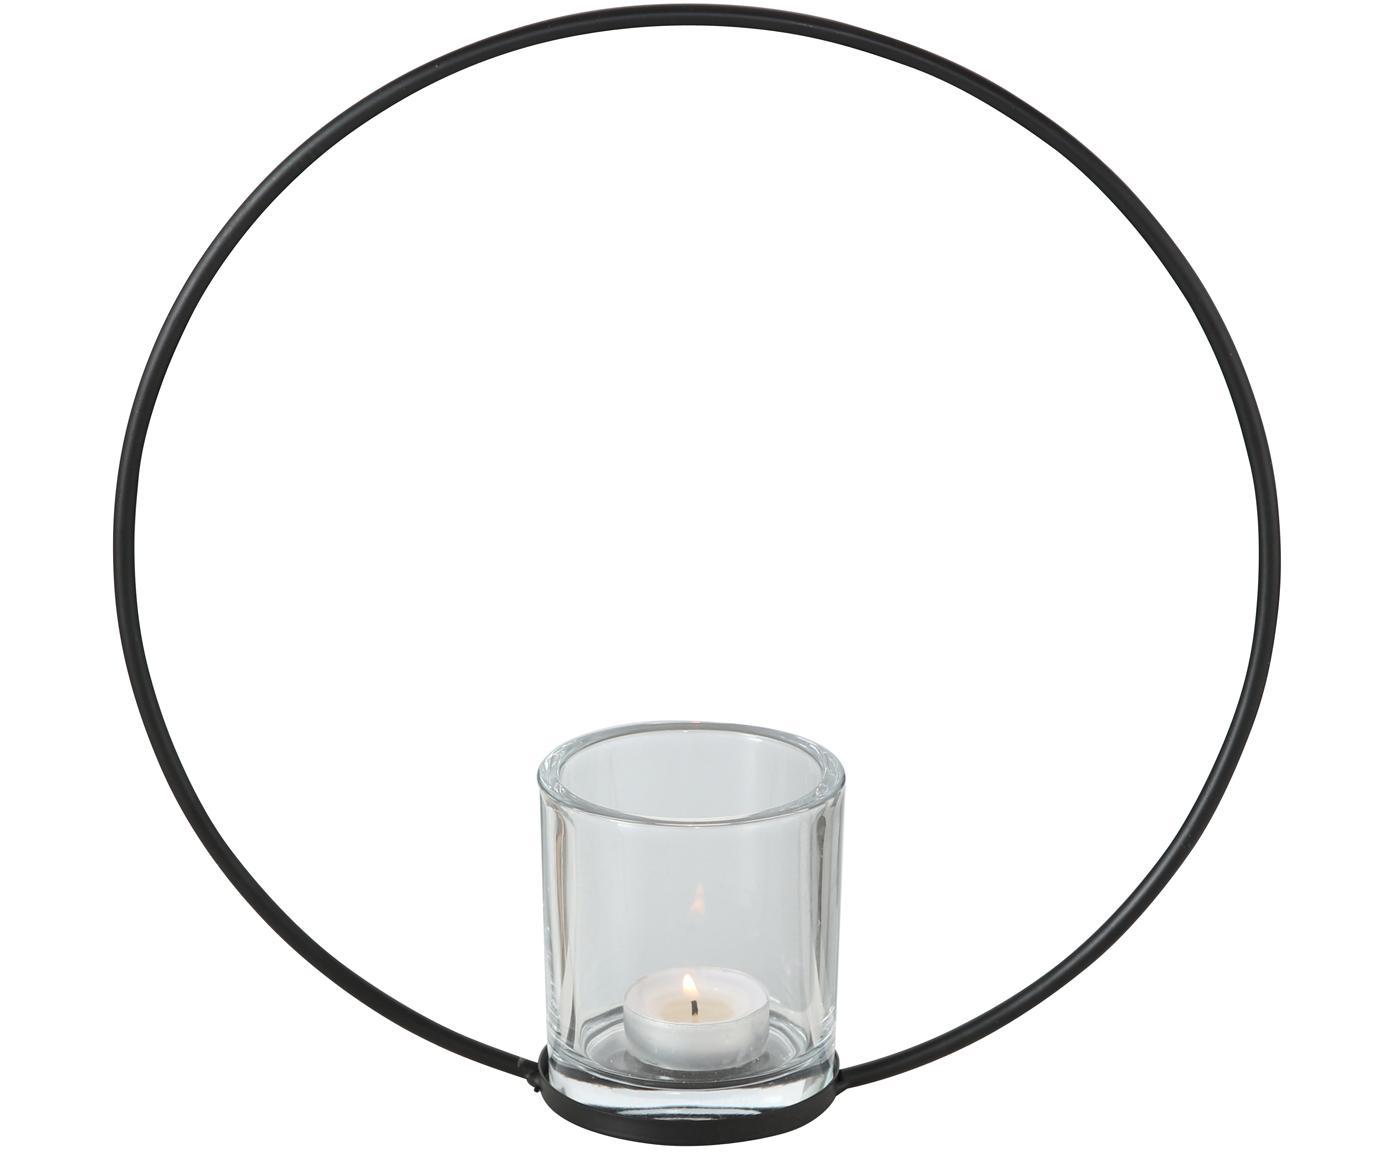 Portacandela Rumba, Metallo, vetro, Nero, Ø 30 x Prof. 8 cm